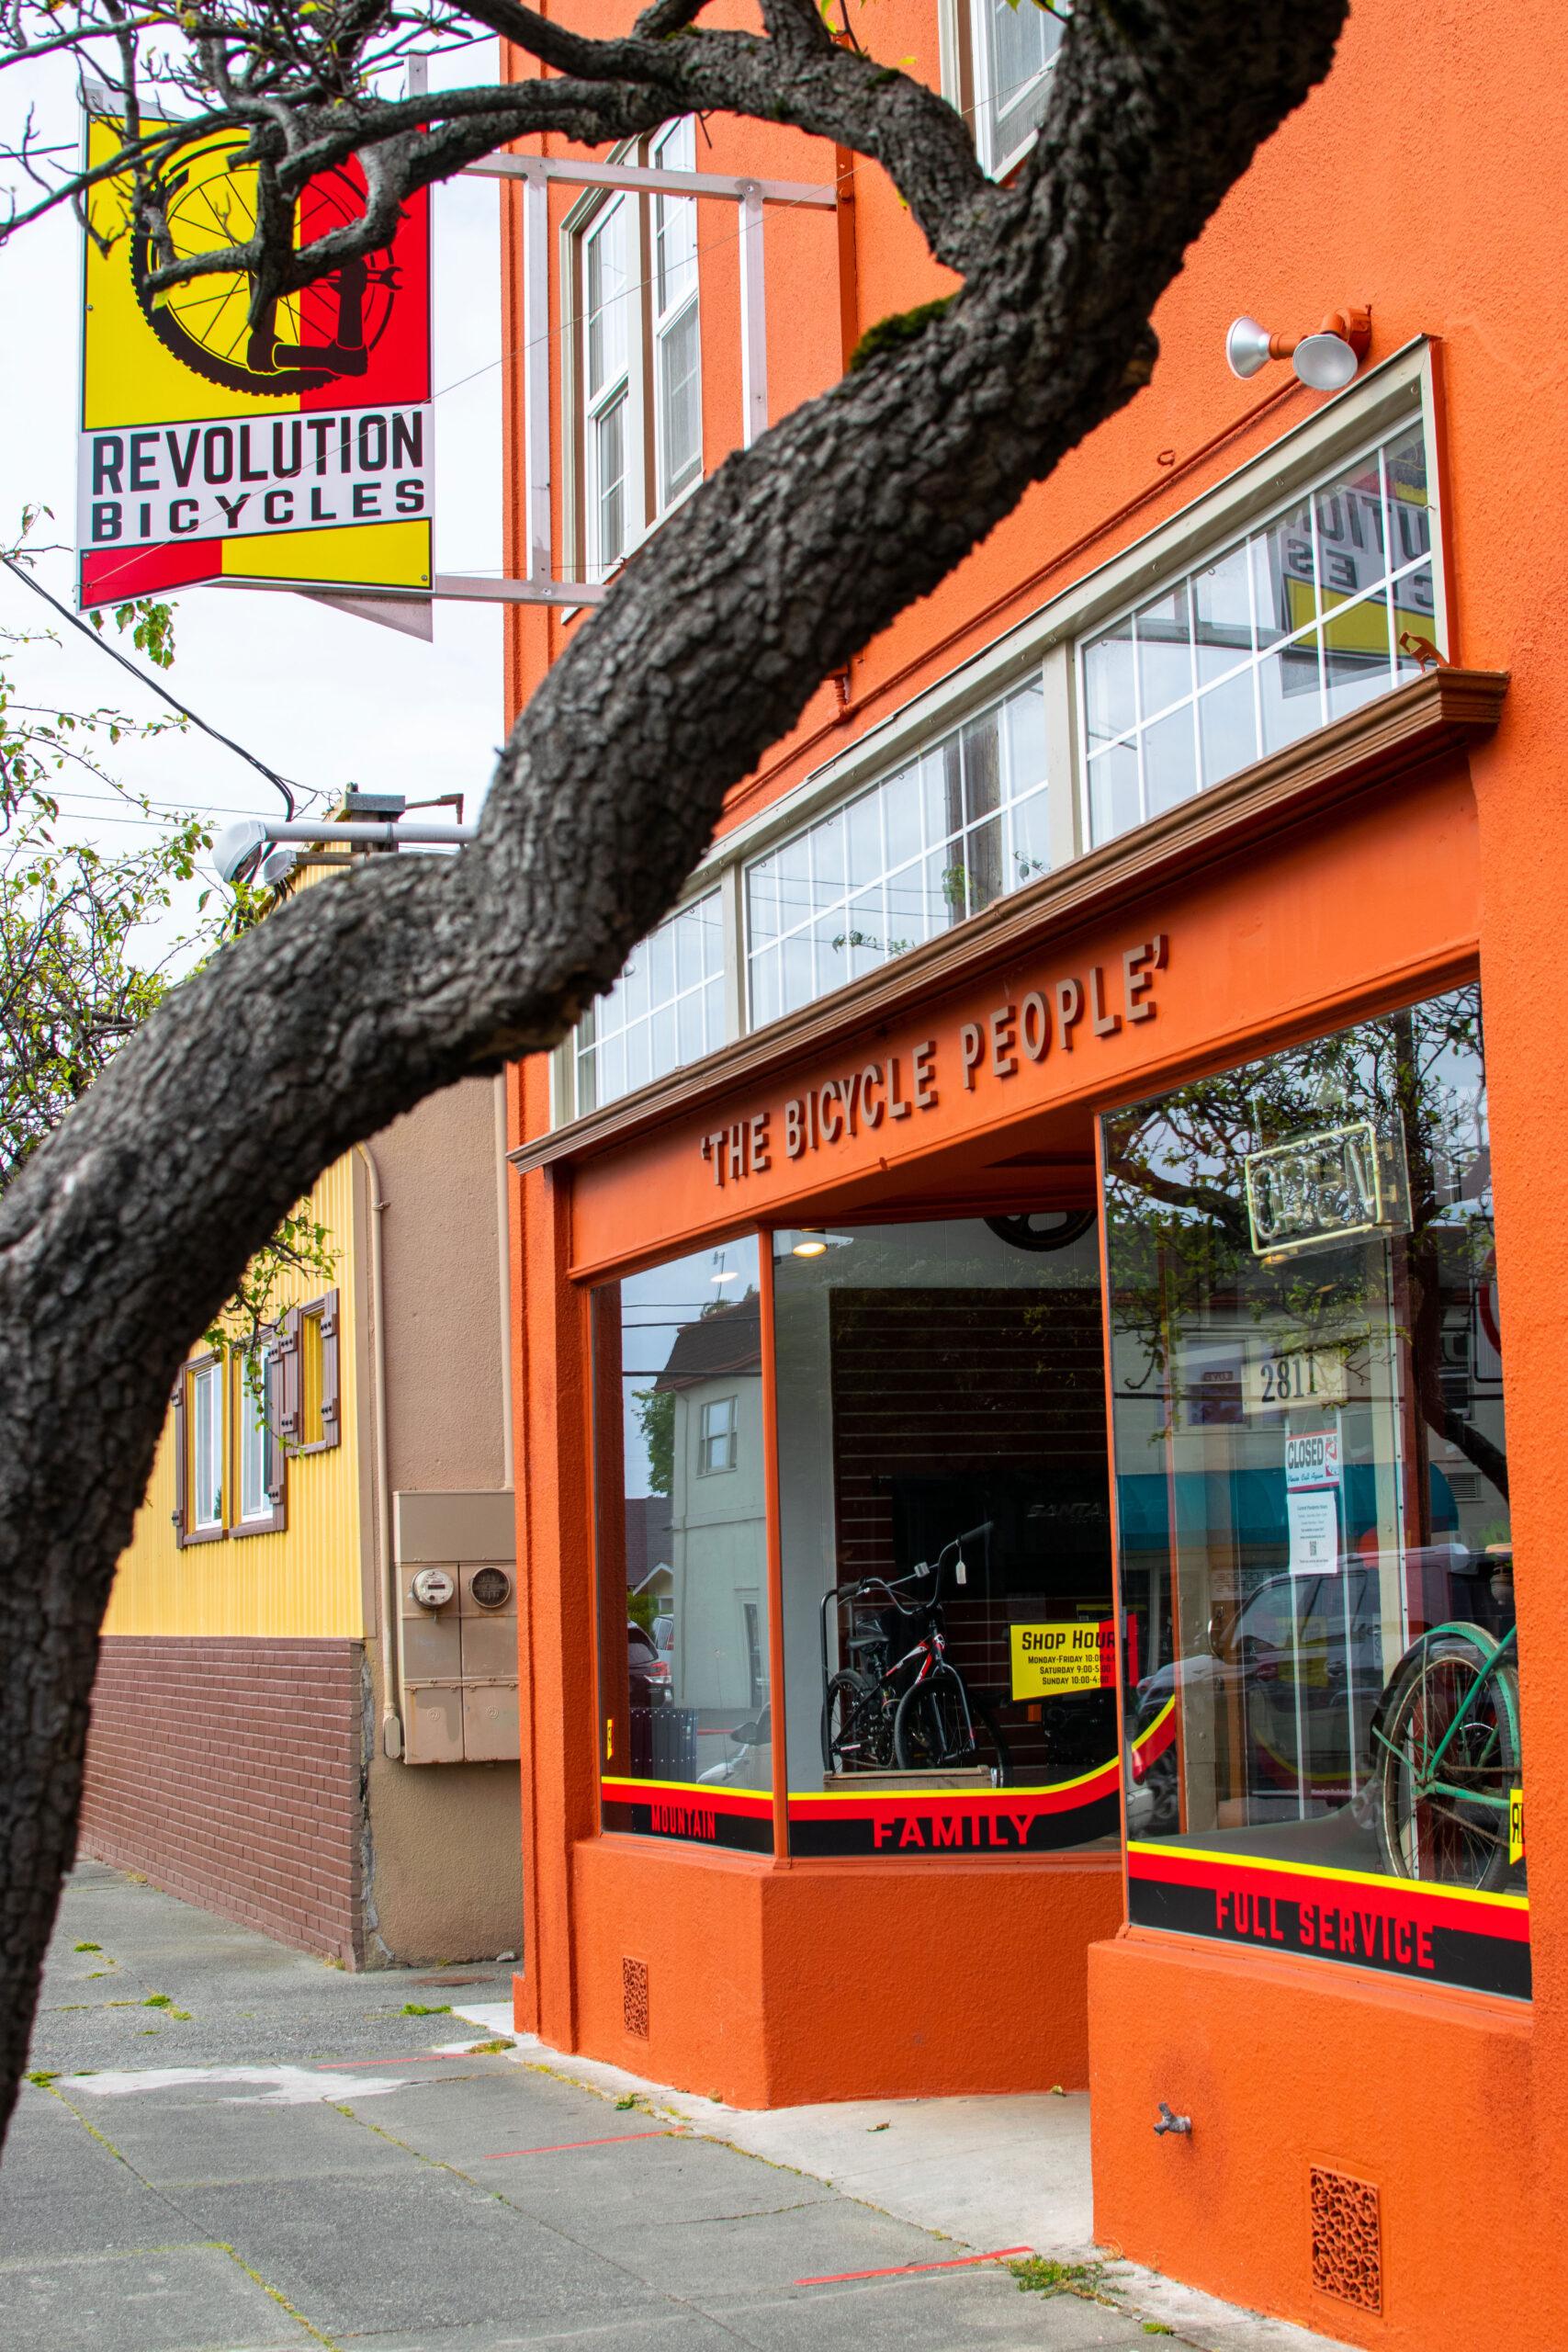 Revolution Bicycles